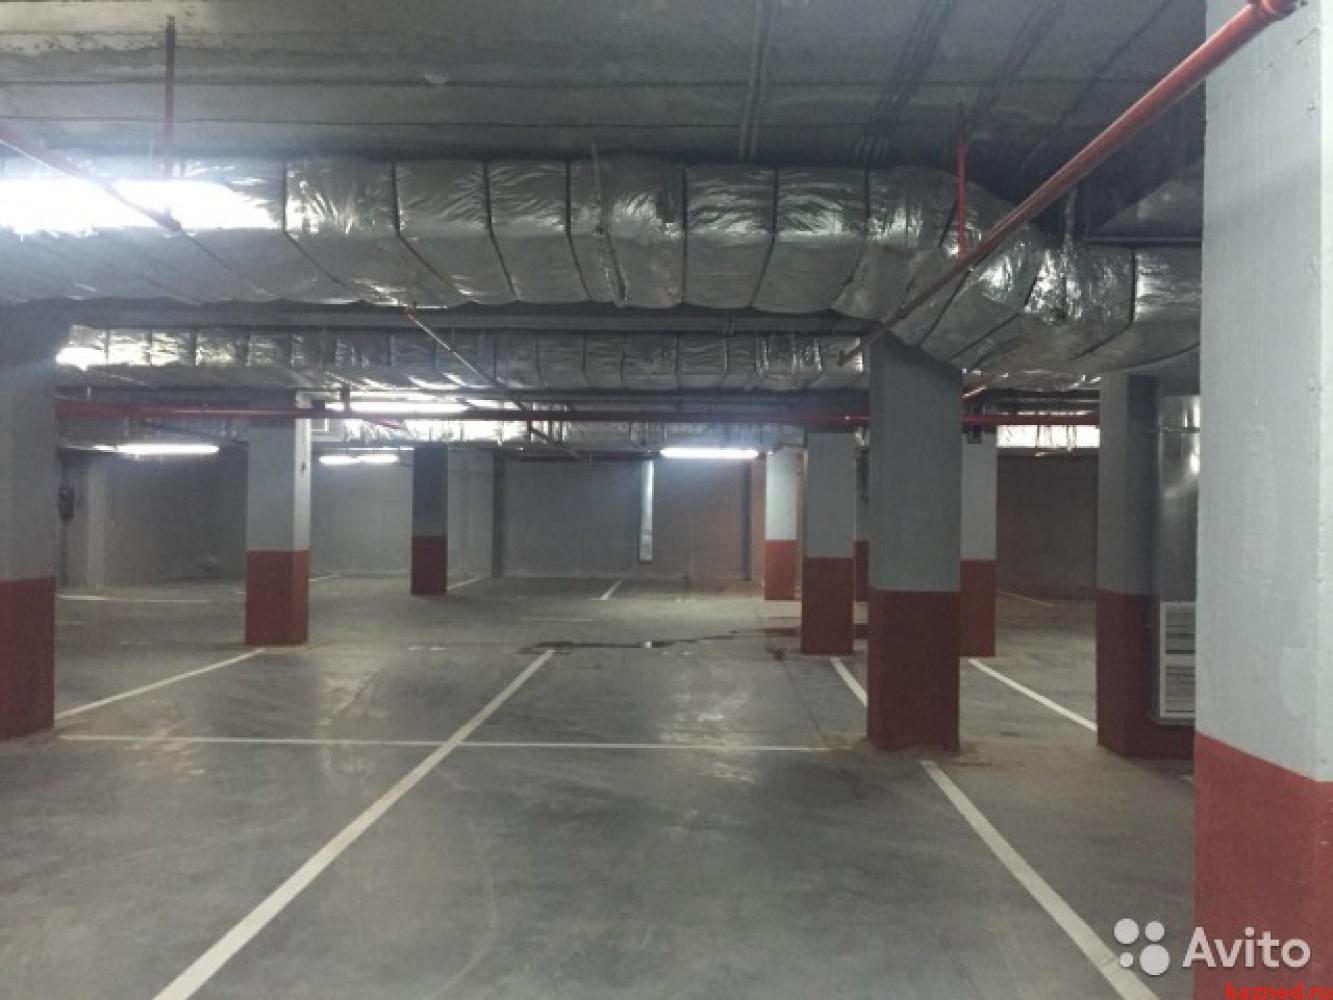 Продажа  гаража Павлюхина,110В, 14 м2  (миниатюра №1)